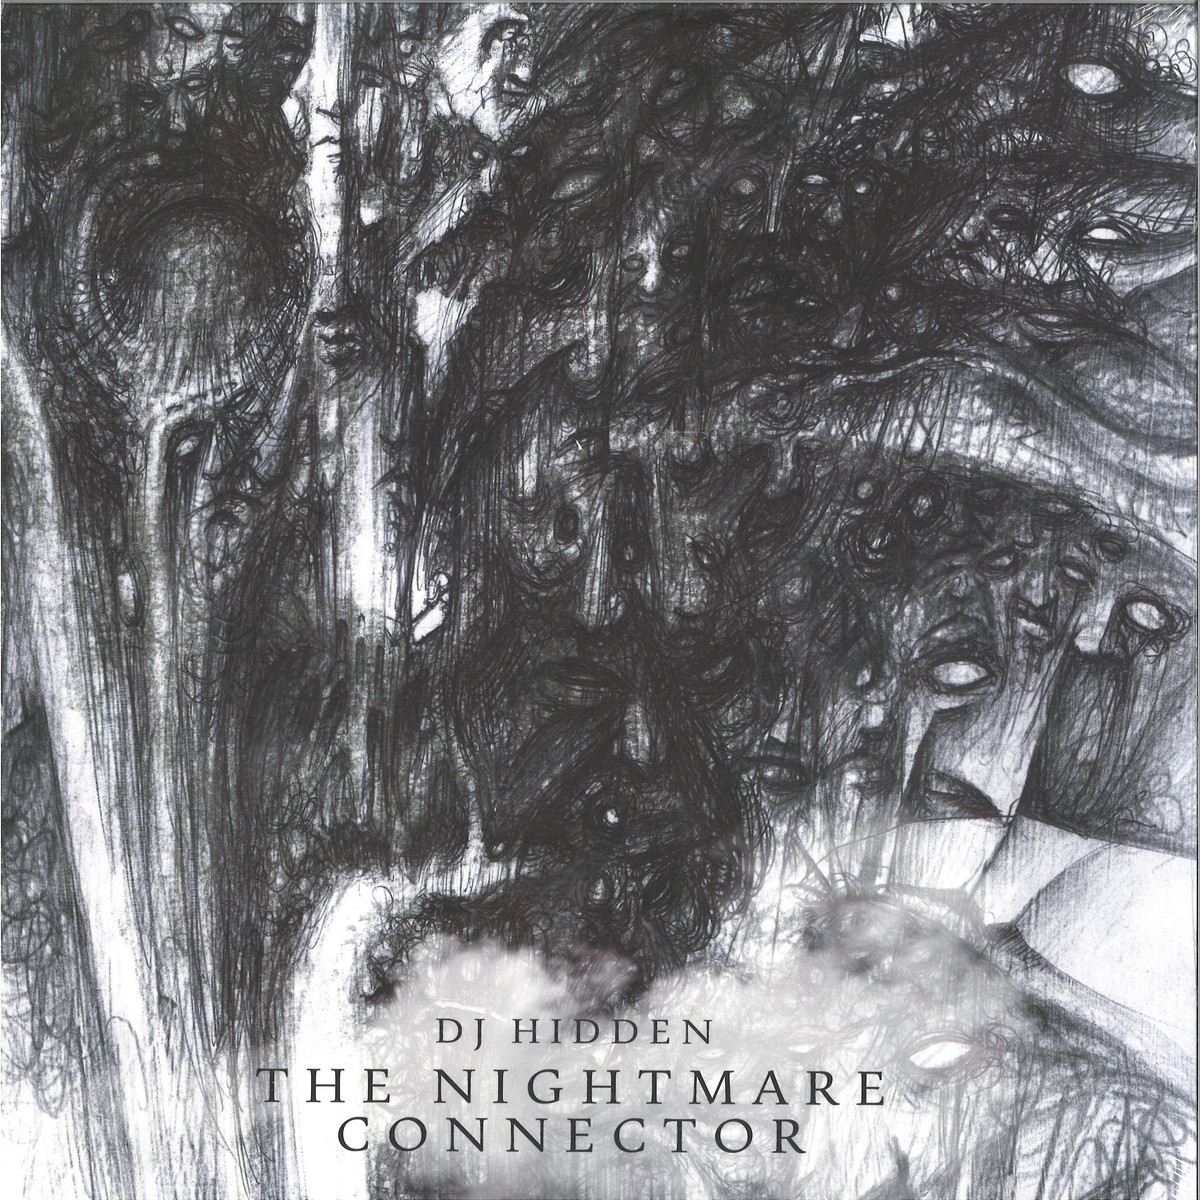 DJ Hidden - The Nightmare Connector / PRSPCT Recordings